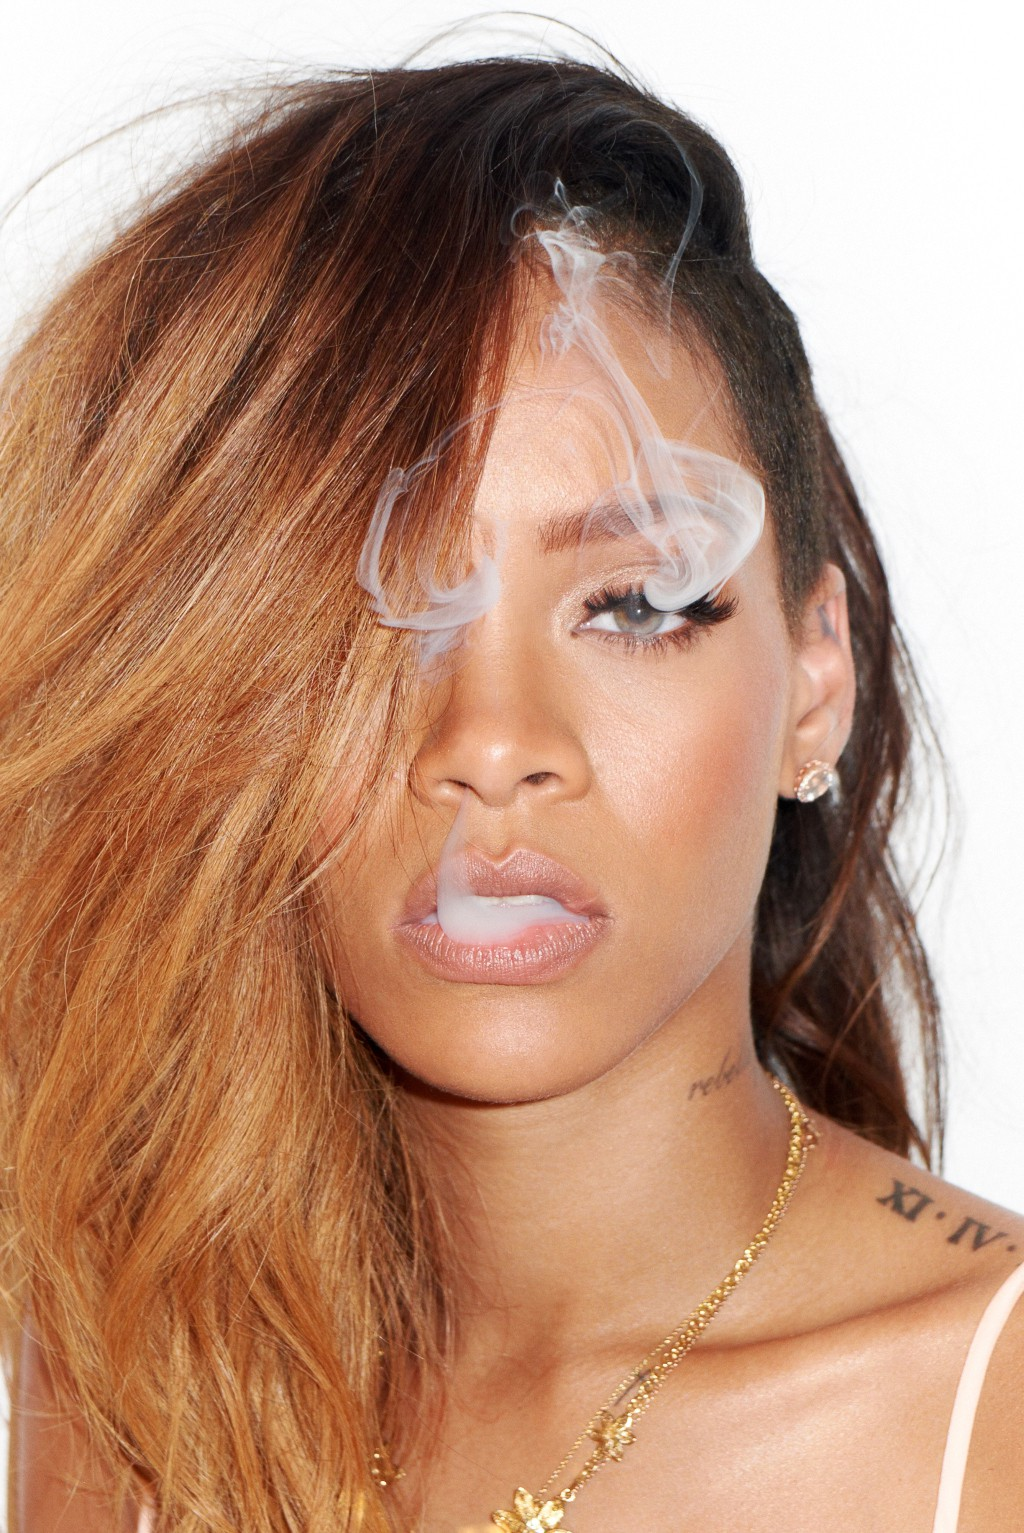 http://4.bp.blogspot.com/-MnDwQFNdPA4/URCfuz8o4WI/AAAAAAABY8o/OMcSaHm9WnM/s1600/Rihanna-magazine-photo-shoot-20134.jpg